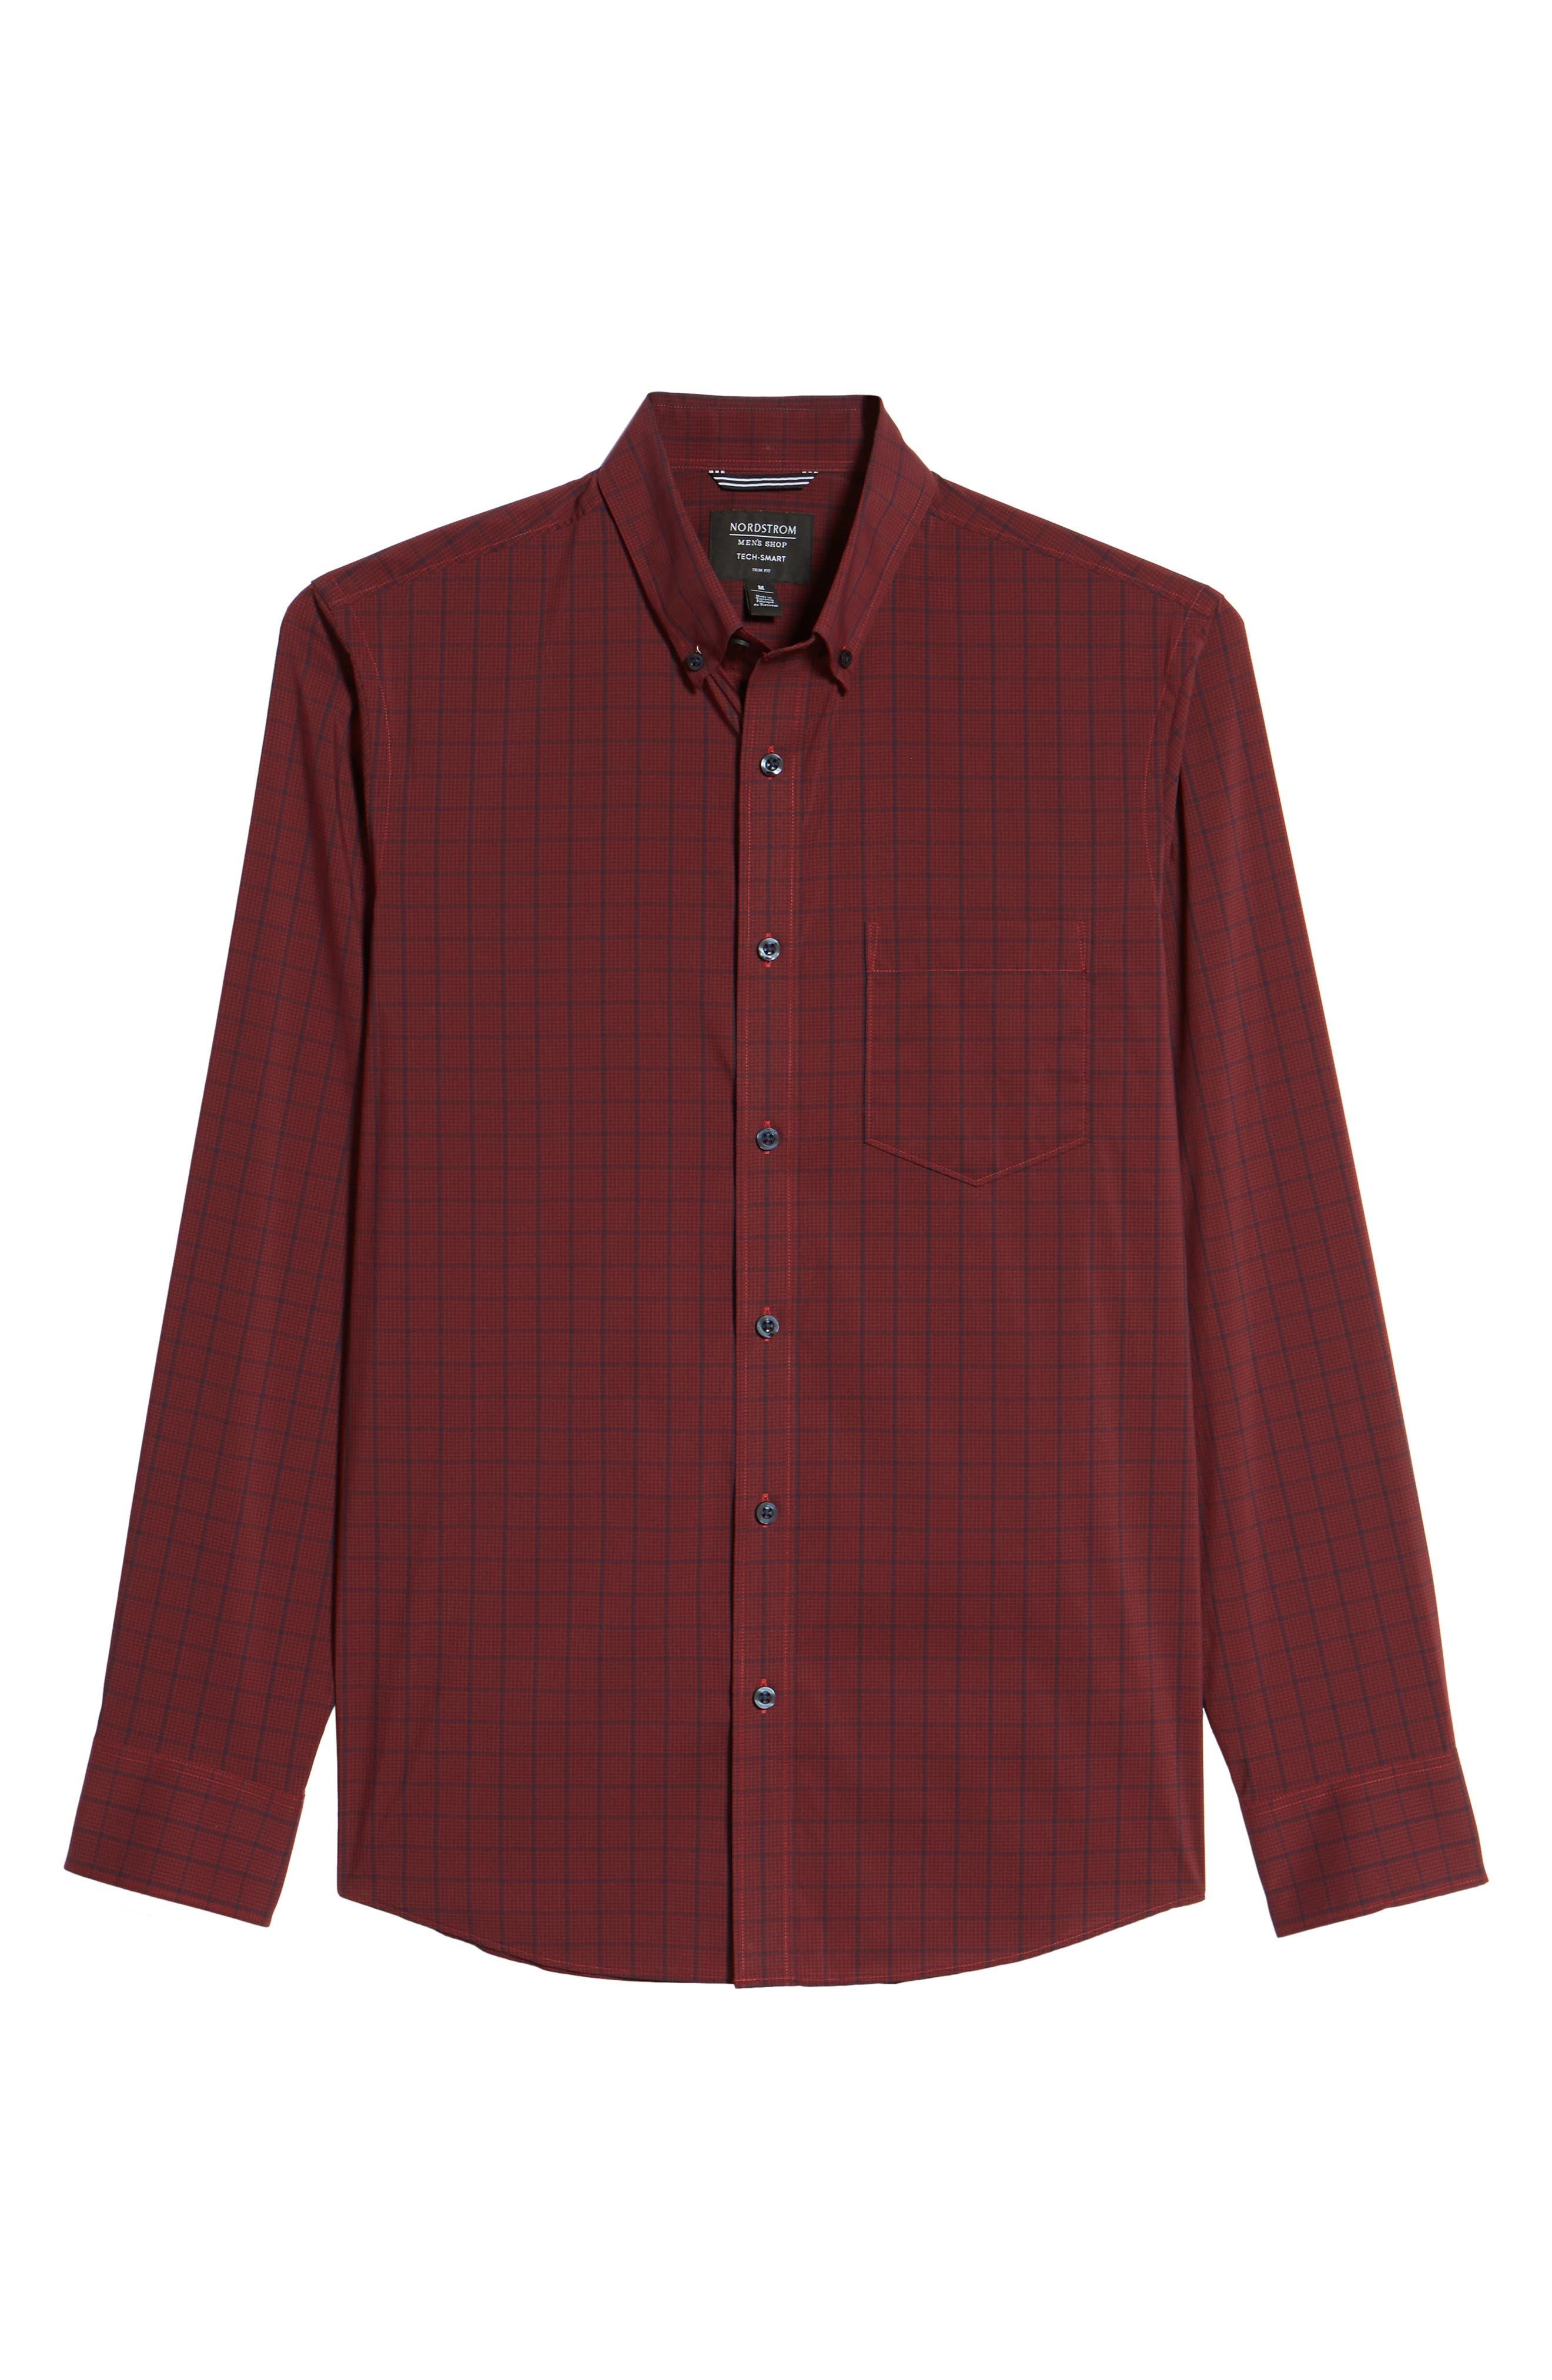 Spade Tech-Smart Plaid Sport Shirt,                             Alternate thumbnail 6, color,                             Burgundy Stem Grid Plaid